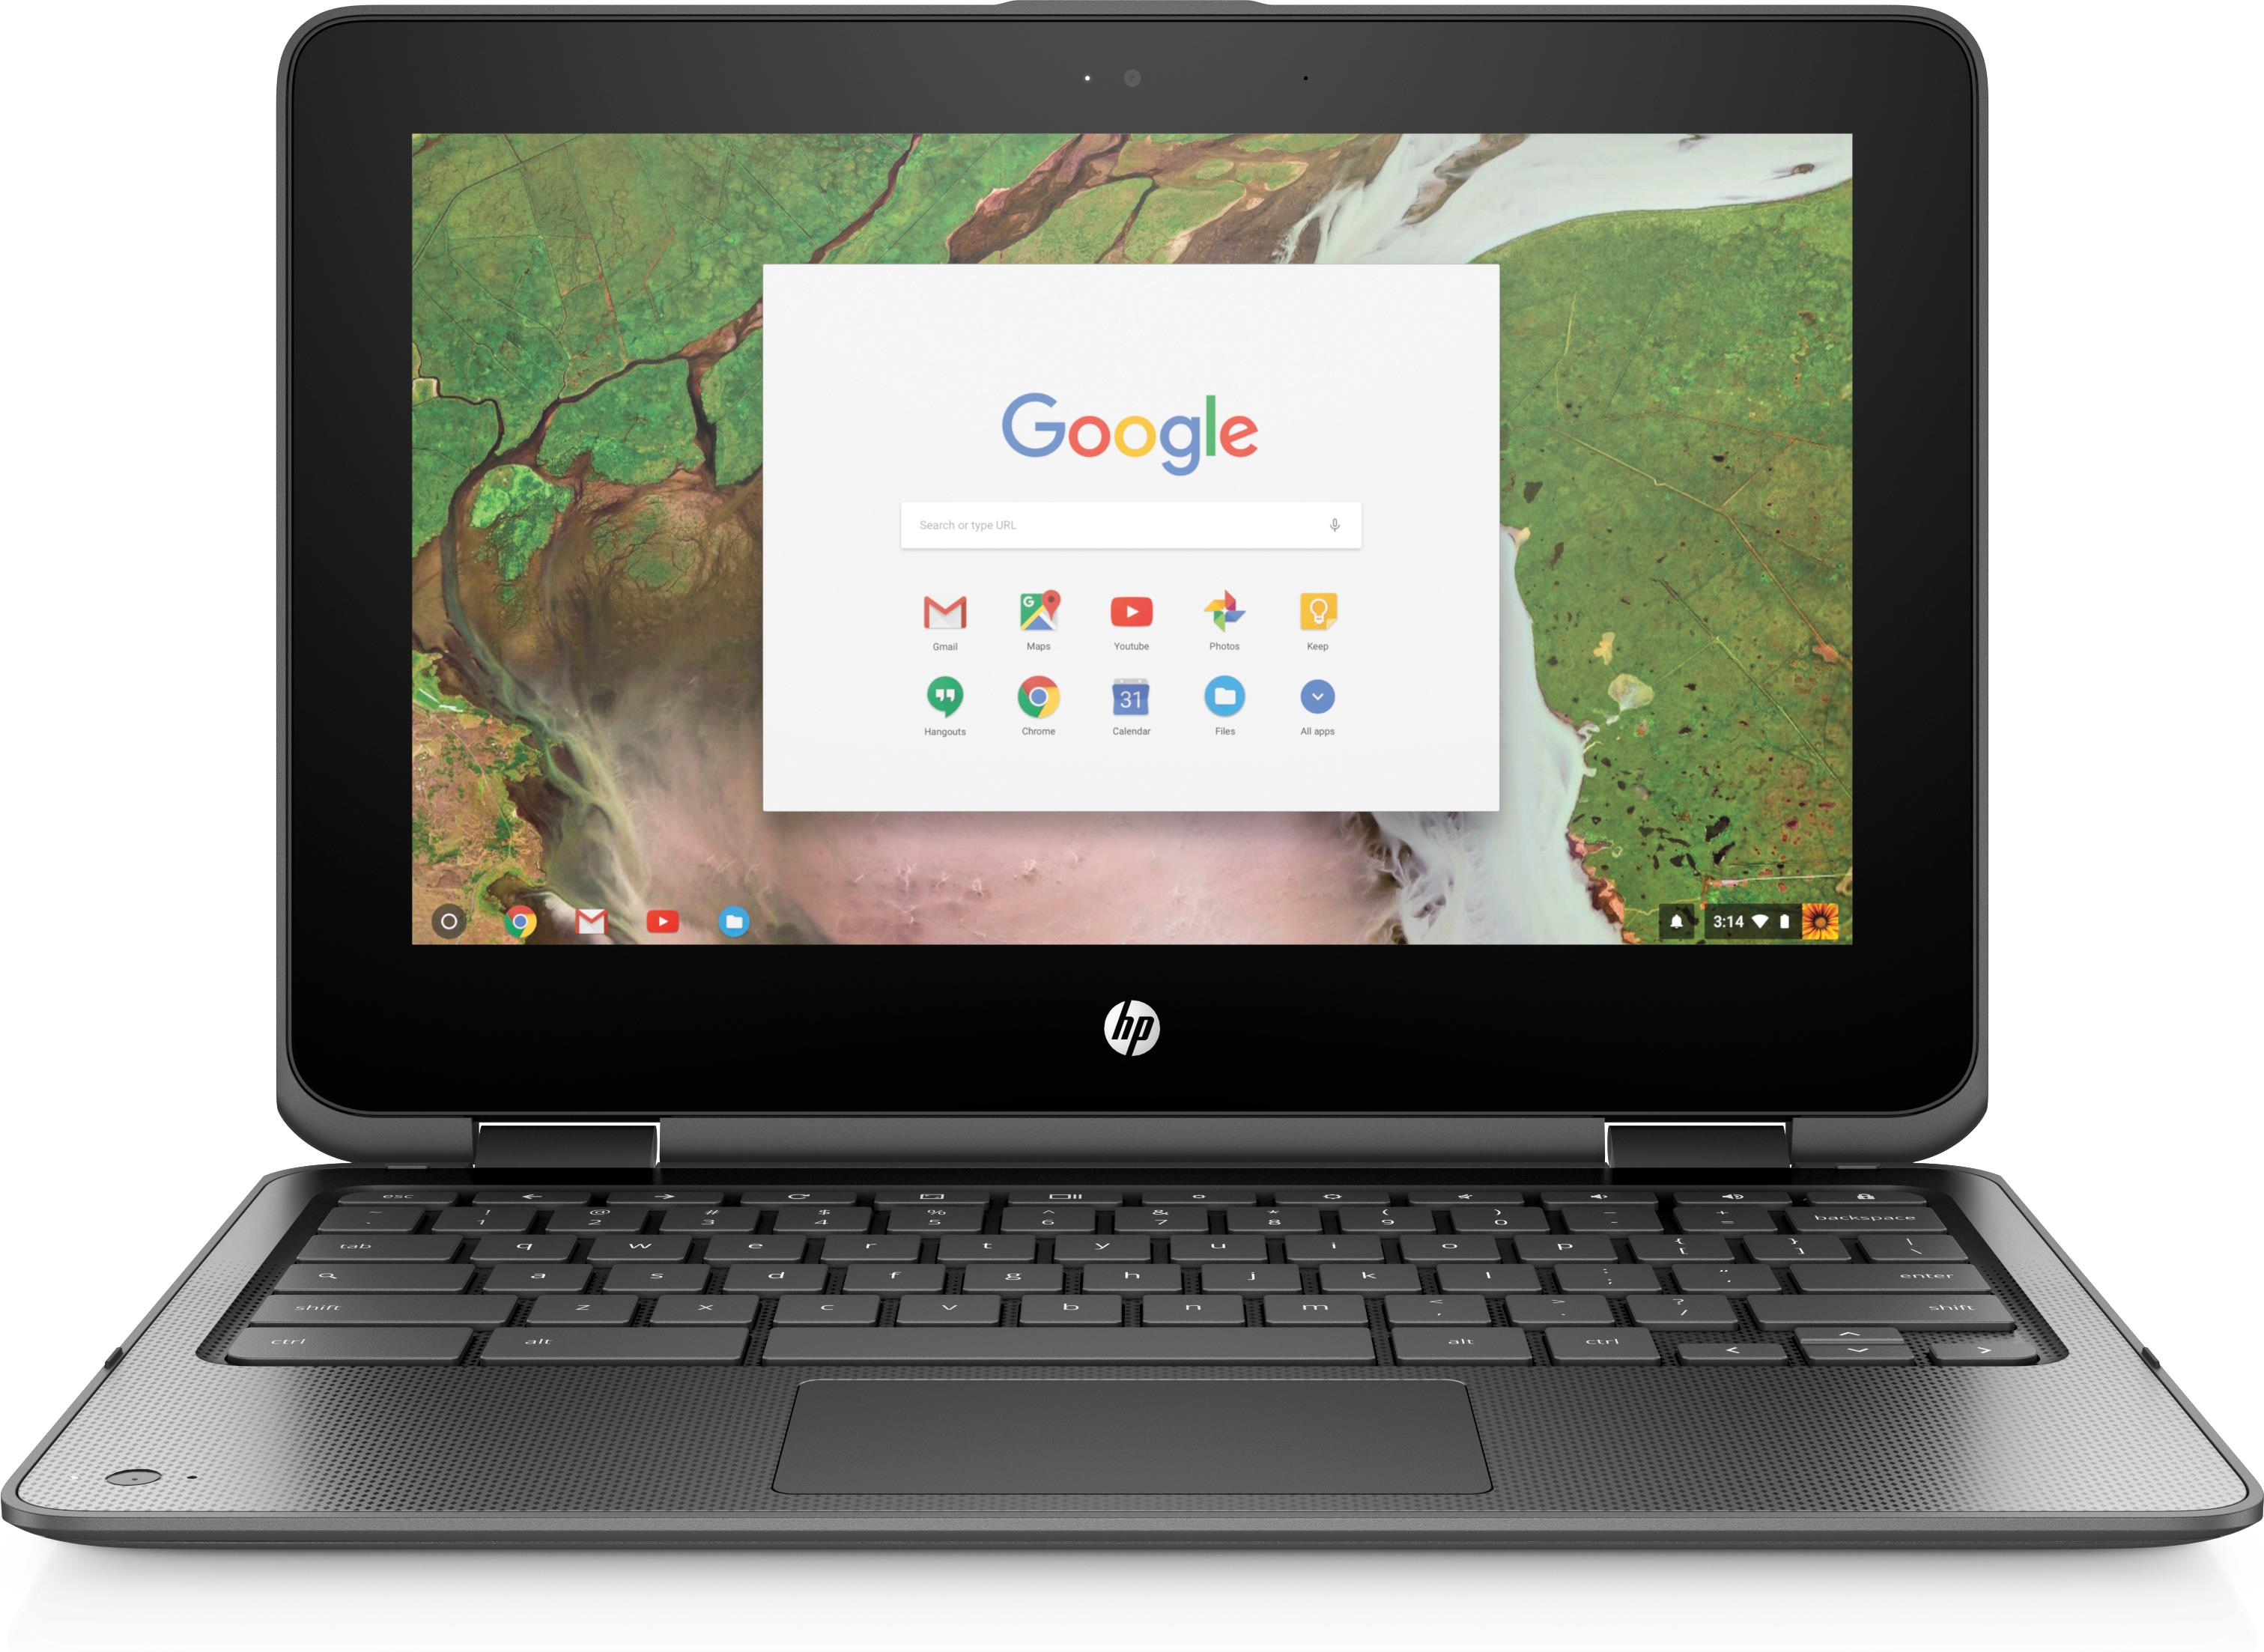 HP Chromebook x360 11 G1 EE (11.6 inch Touchscreen) Notebook Celeron (N3350) 1.1GHz 4GB 64GB eMMC WLAN BT Chrome OS (HD Graphics 500)